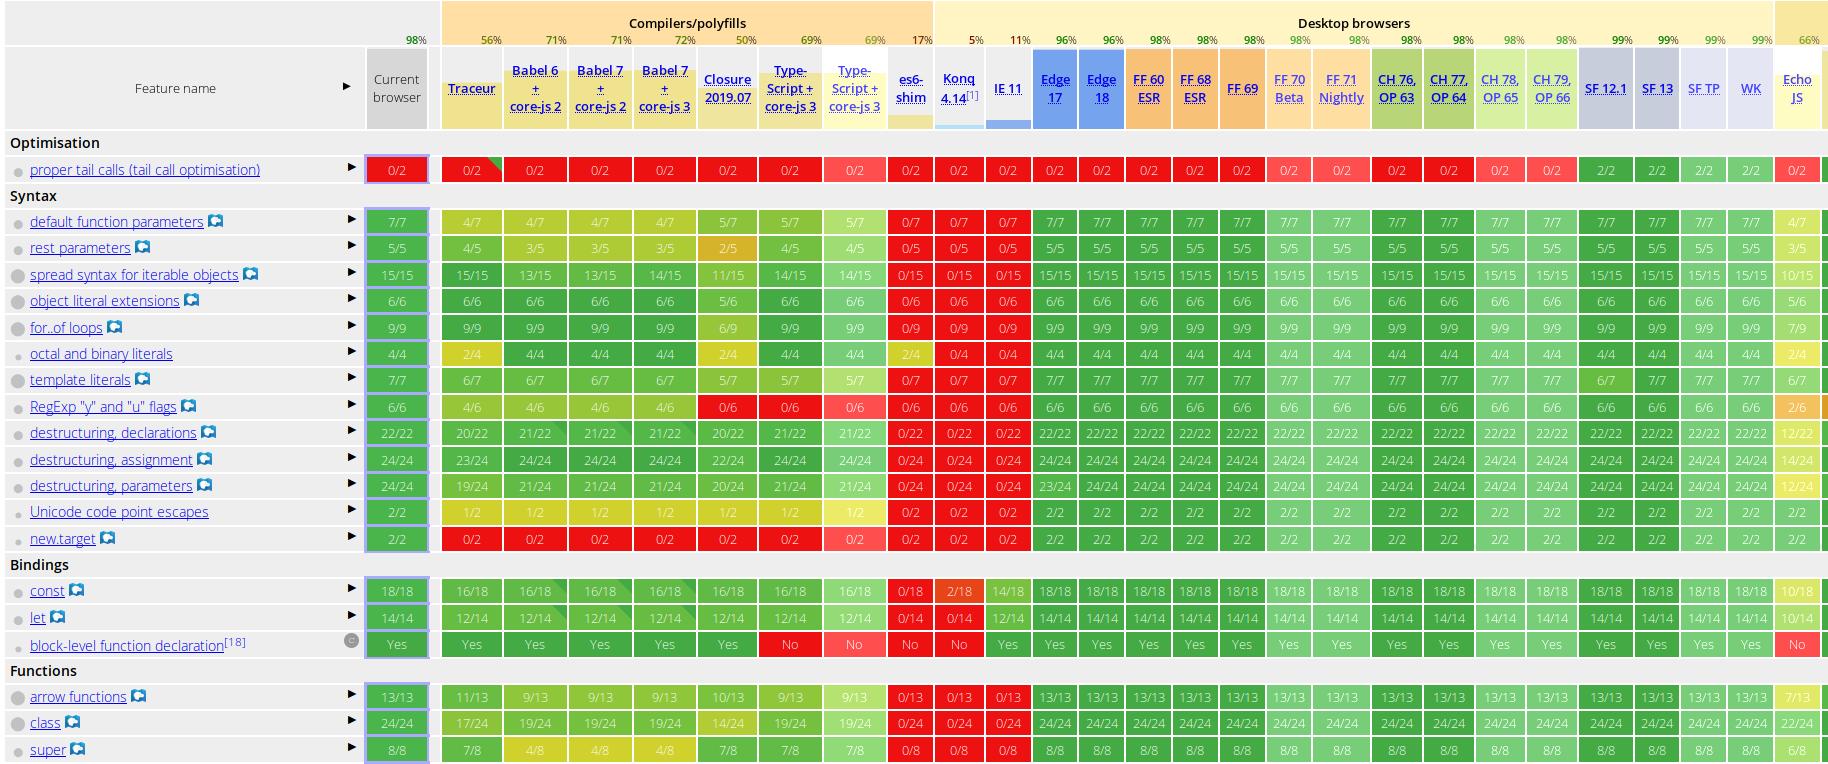 Tabla comparativa ECMAScript 6 de varios navegadores